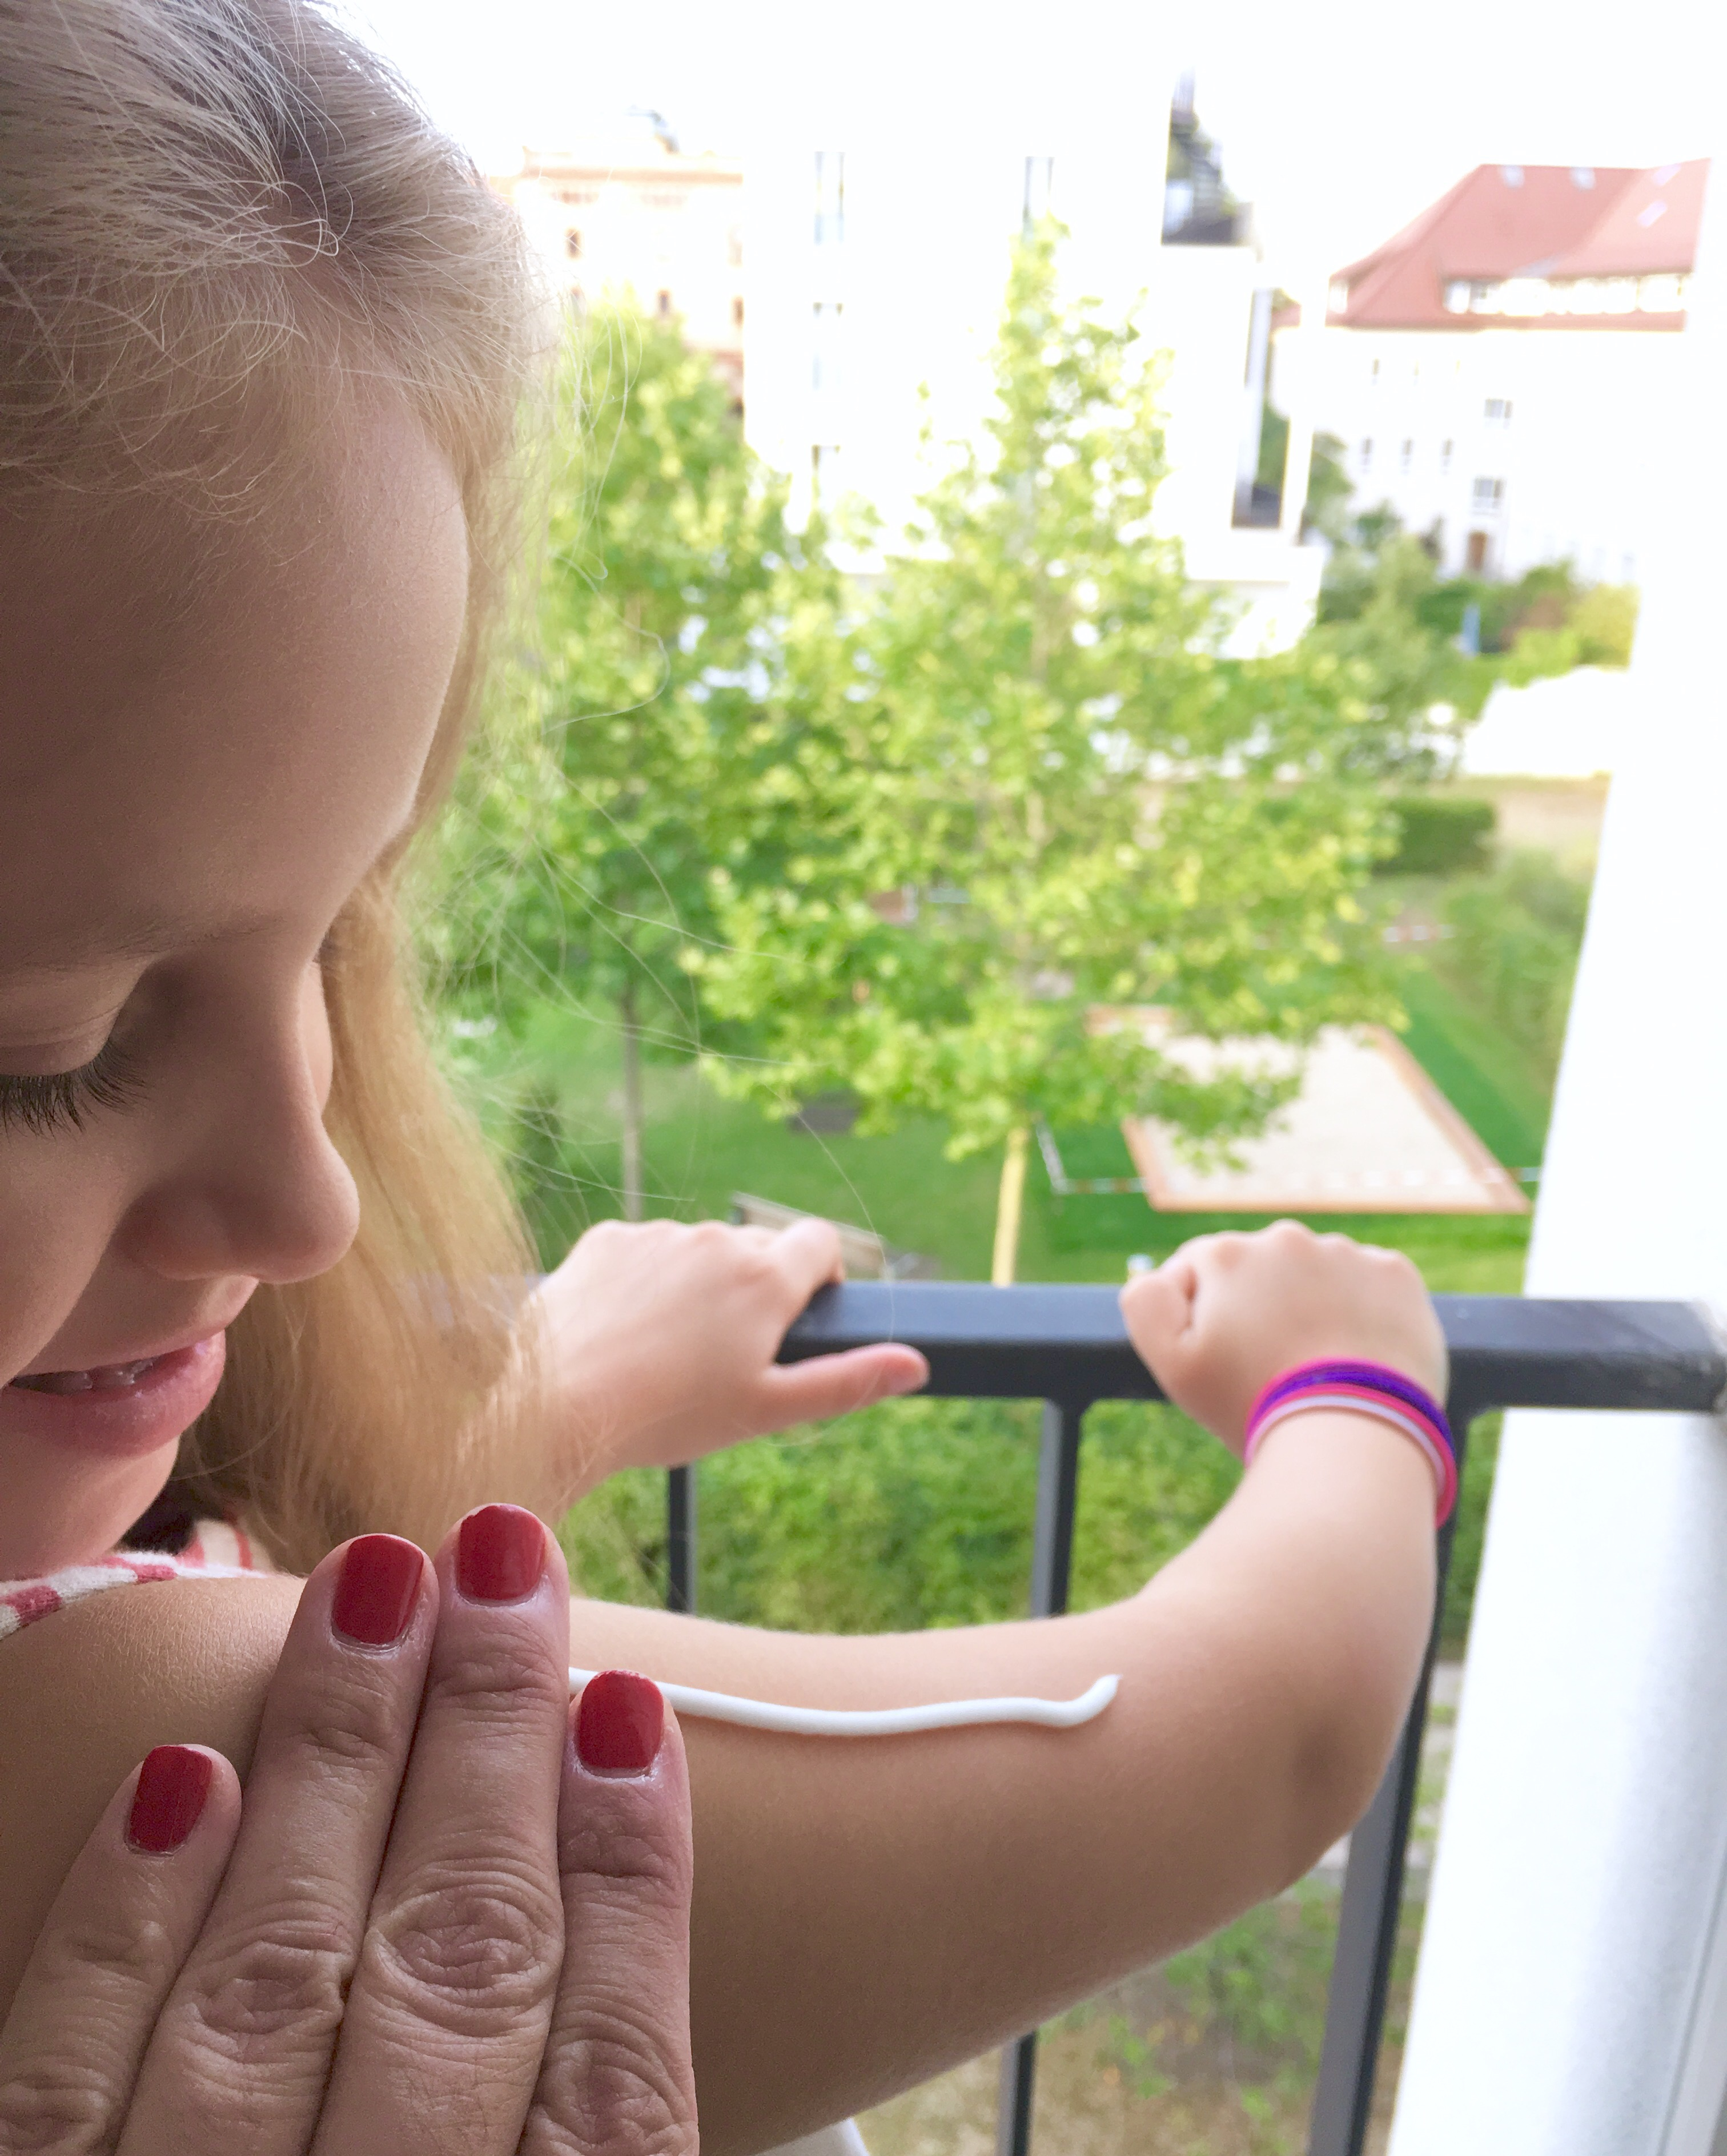 Empfindliche Kinderhaut, Neurodermitis, Allergie, Apotal, #apotalblogger, Bad Apotheken, Versandapotheke